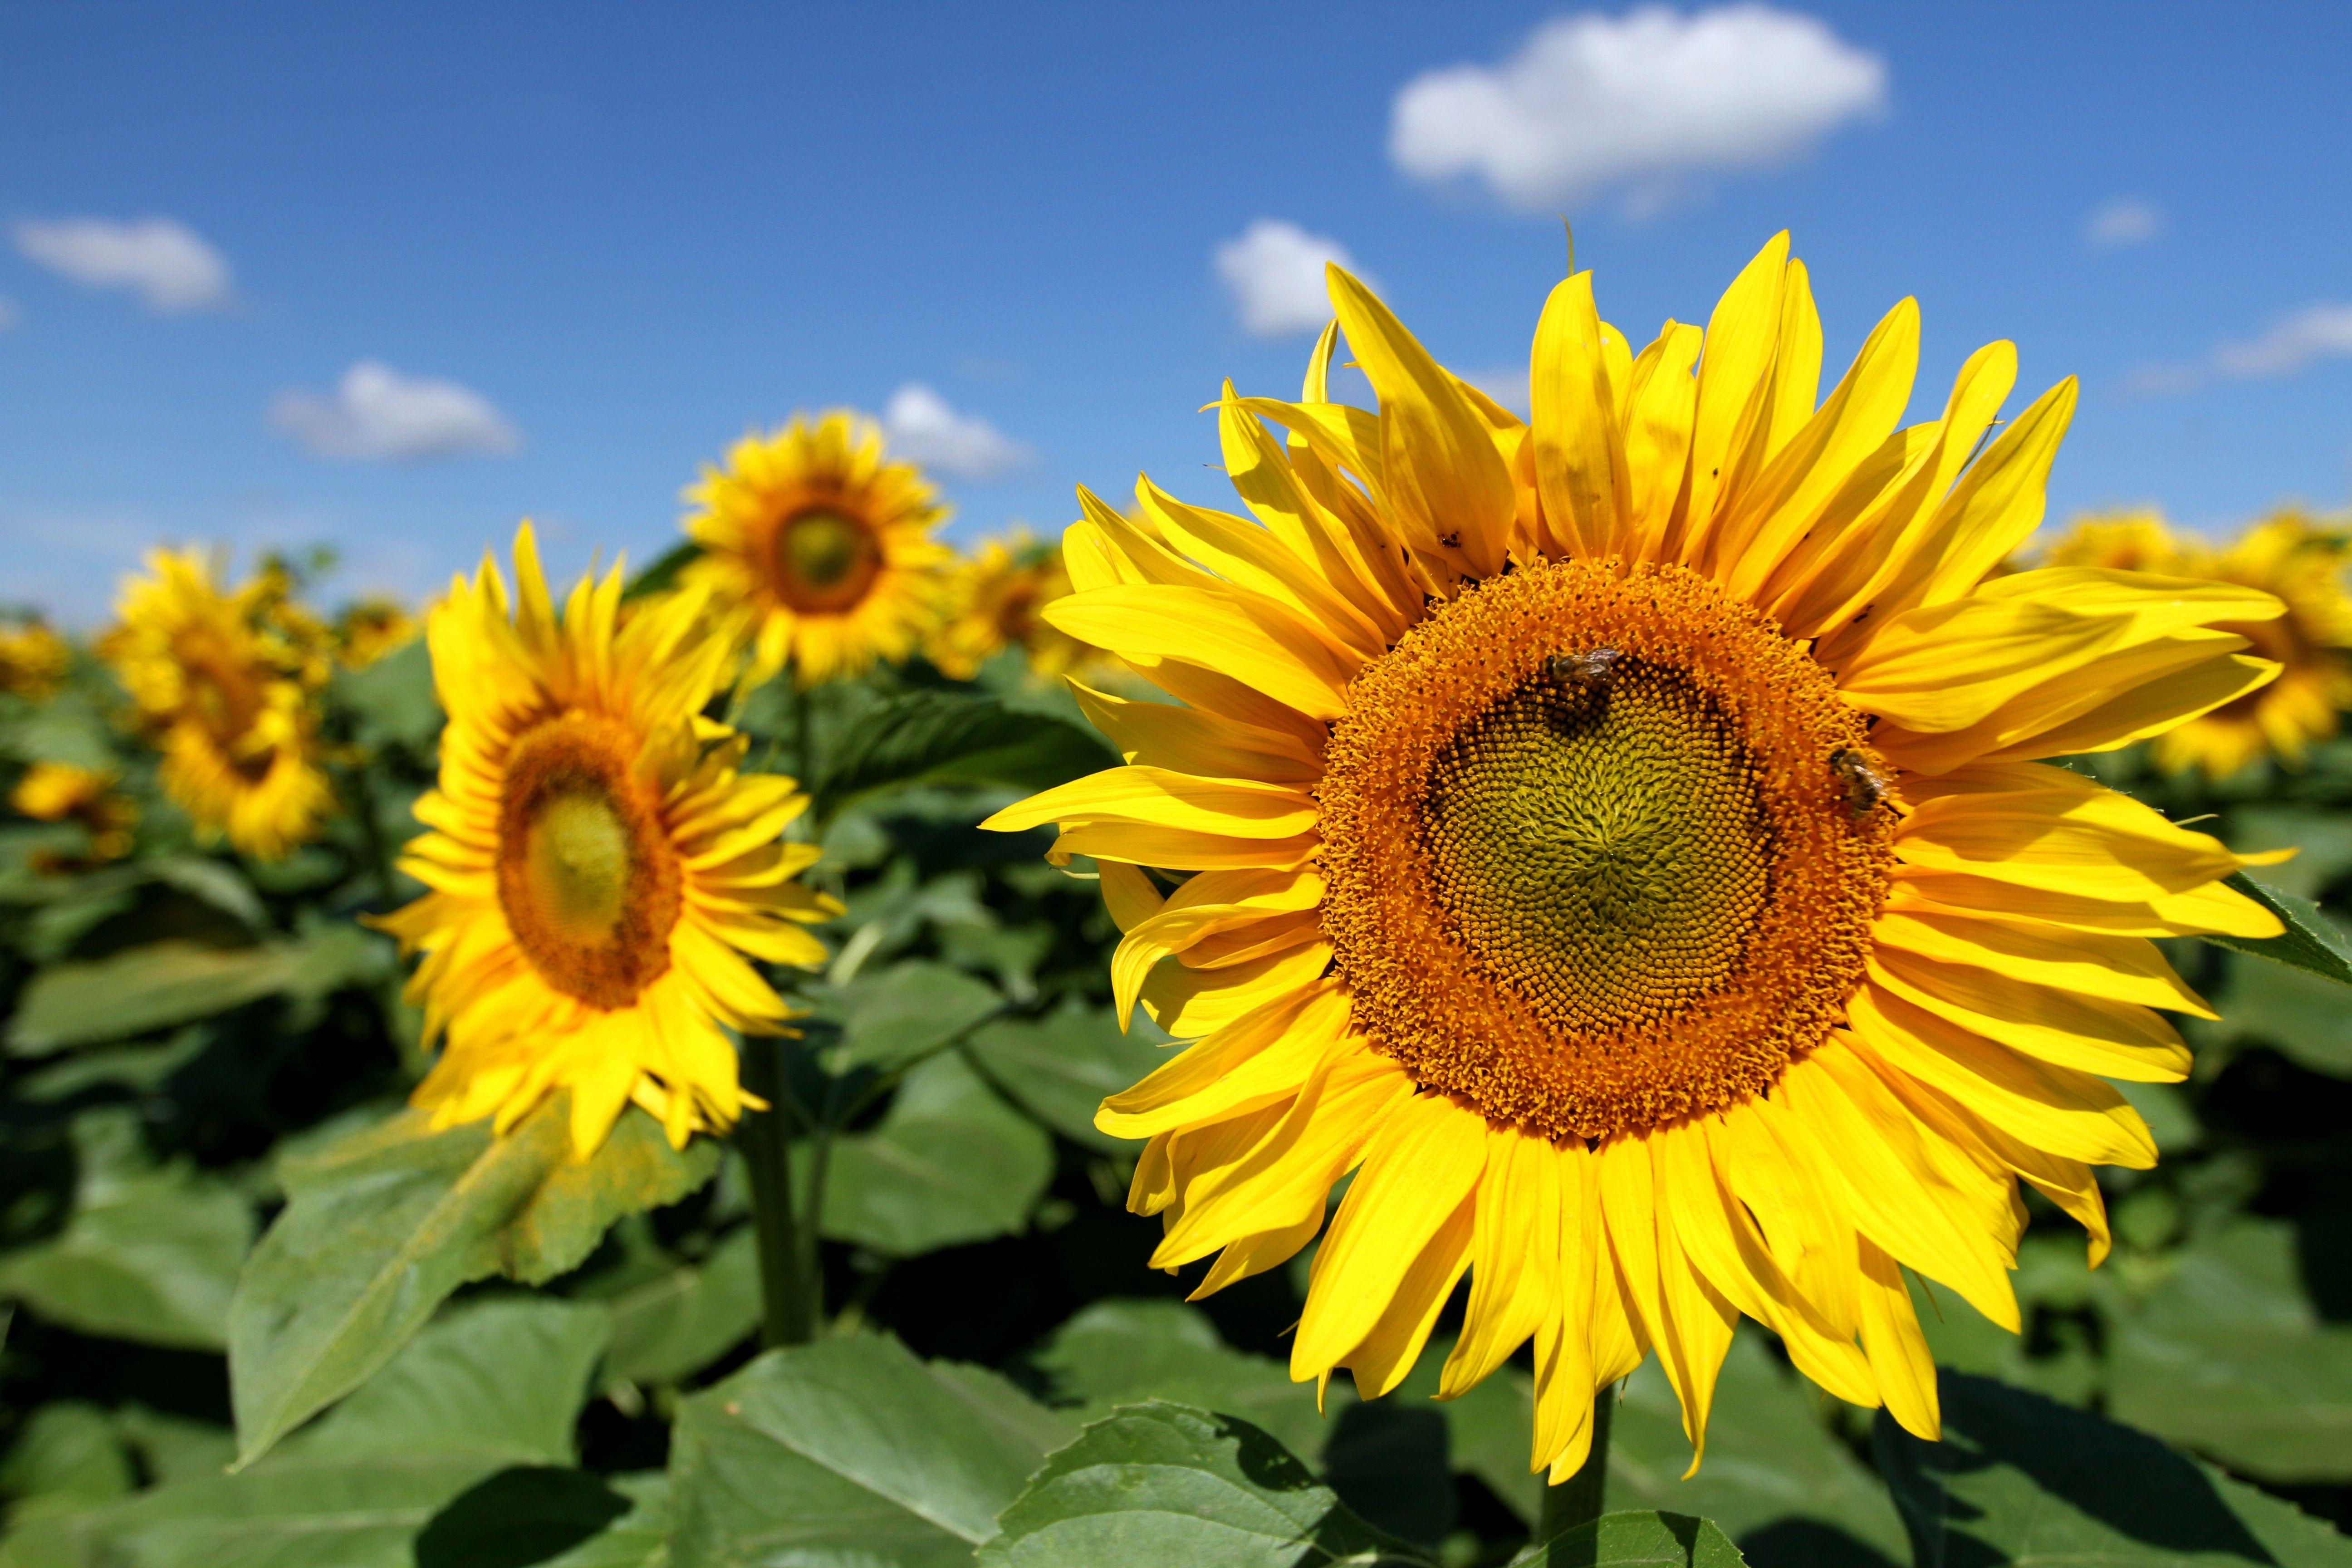 Sunflowers Solar Plexus Chakra Free Things To Do Sunflower Pictures Sunflower